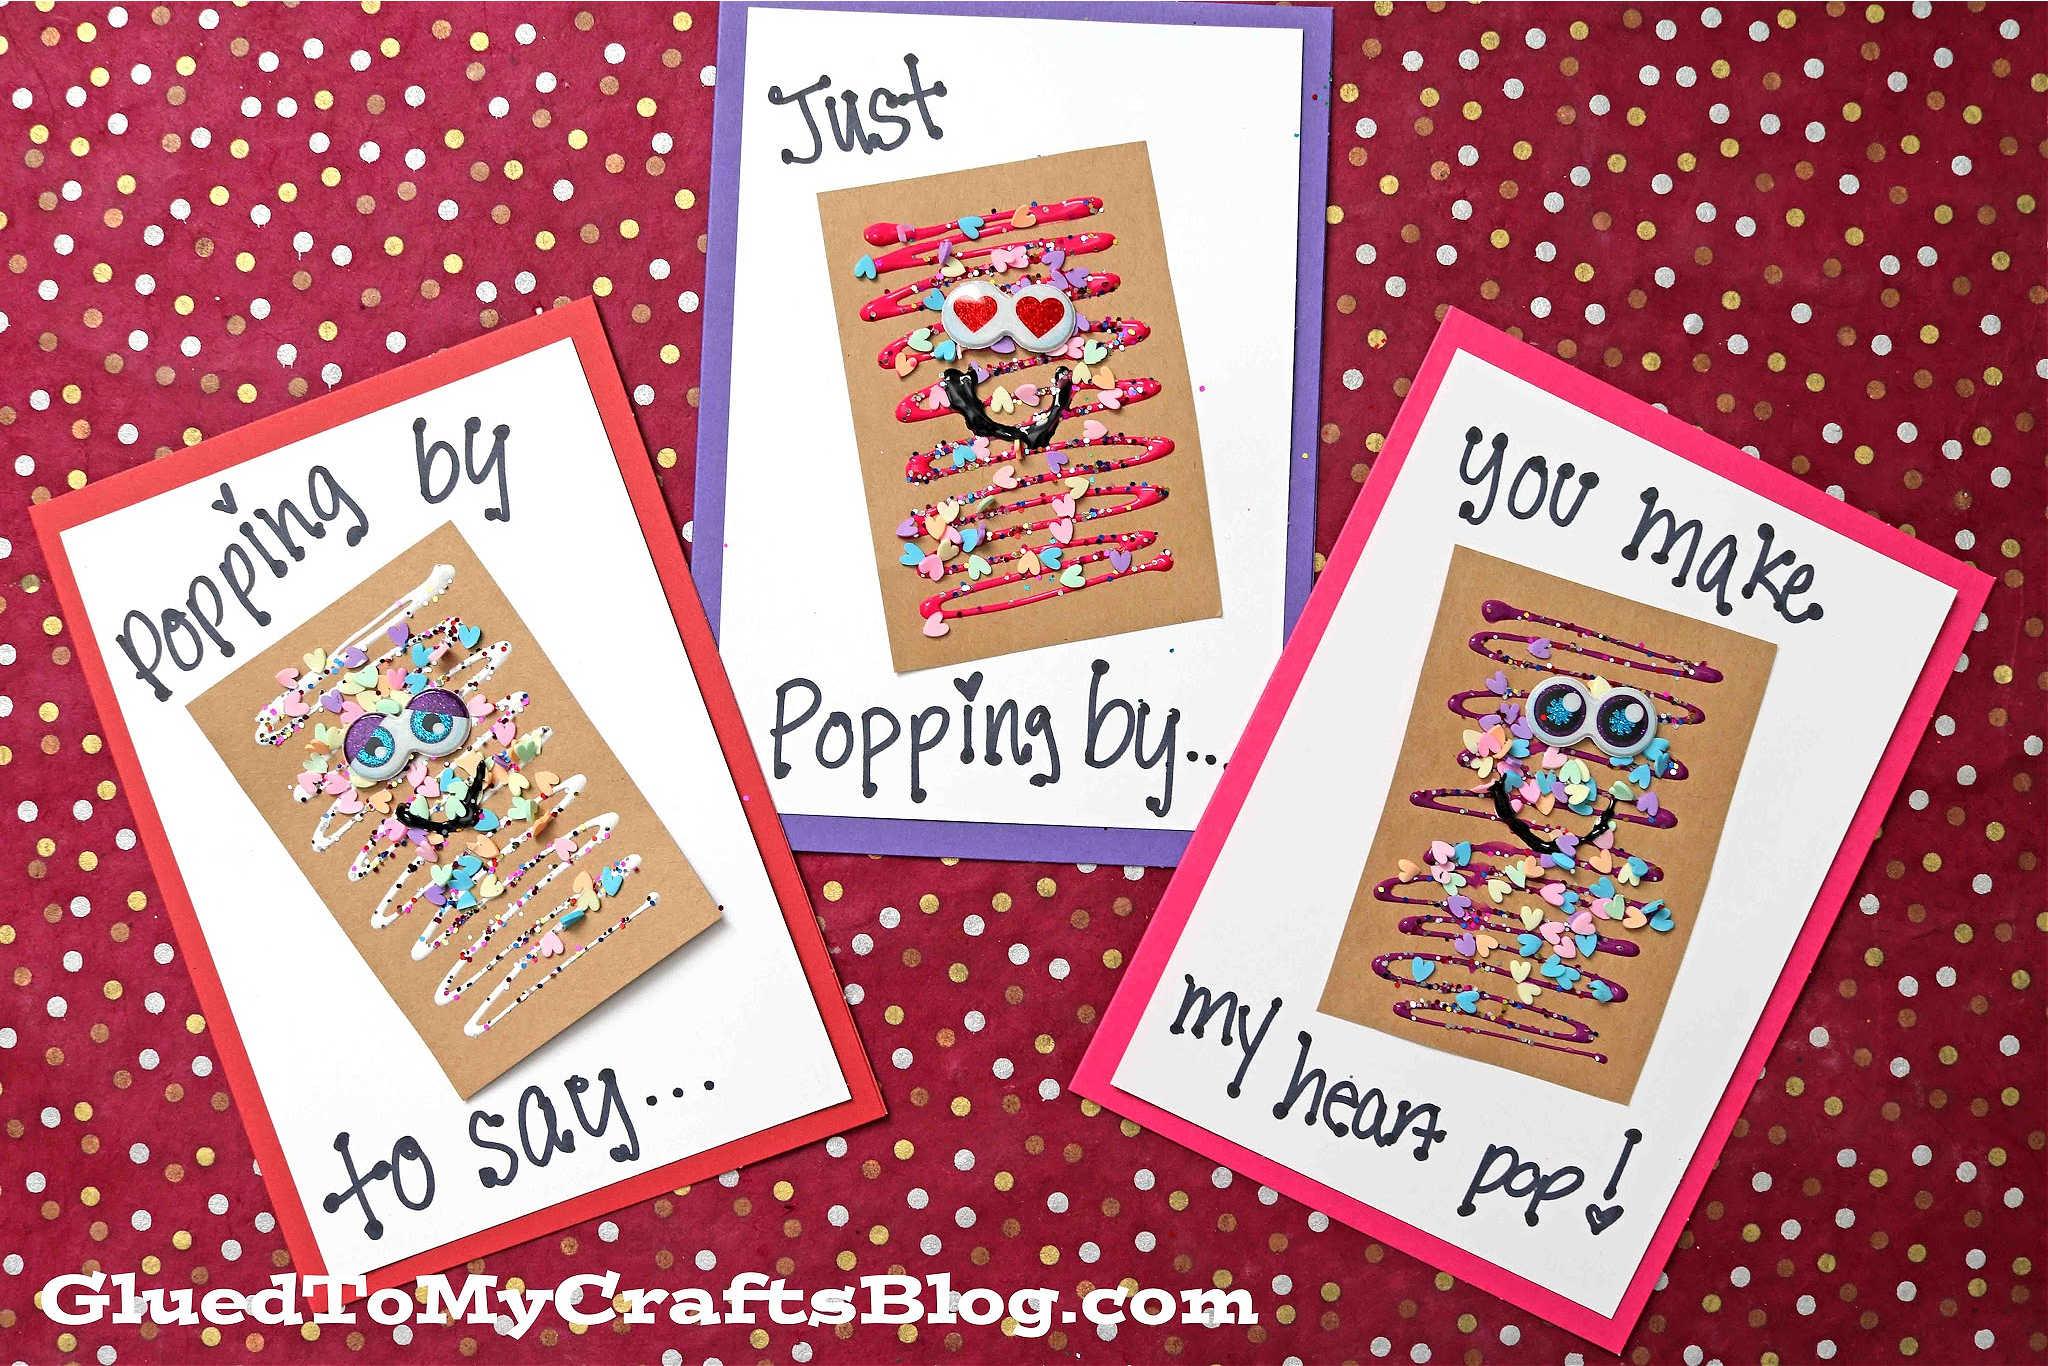 Super FUN Paper Pop-Tart Card Craft For Kids To Make